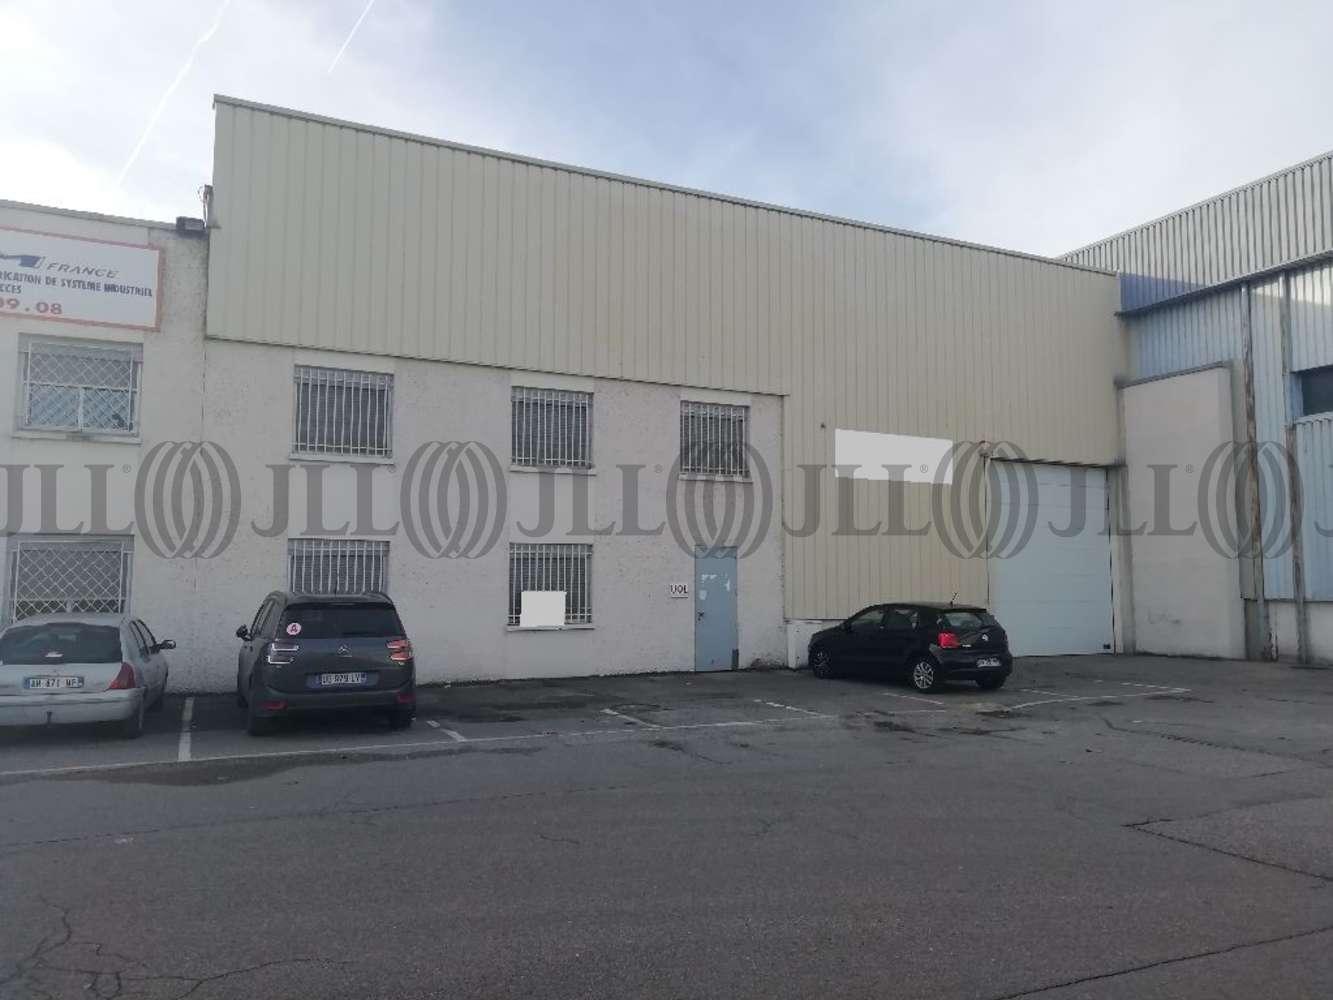 Activités/entrepôt Villeurbanne, 69100 - Location entrepot Villeurbanne (Lyon) - 10928885